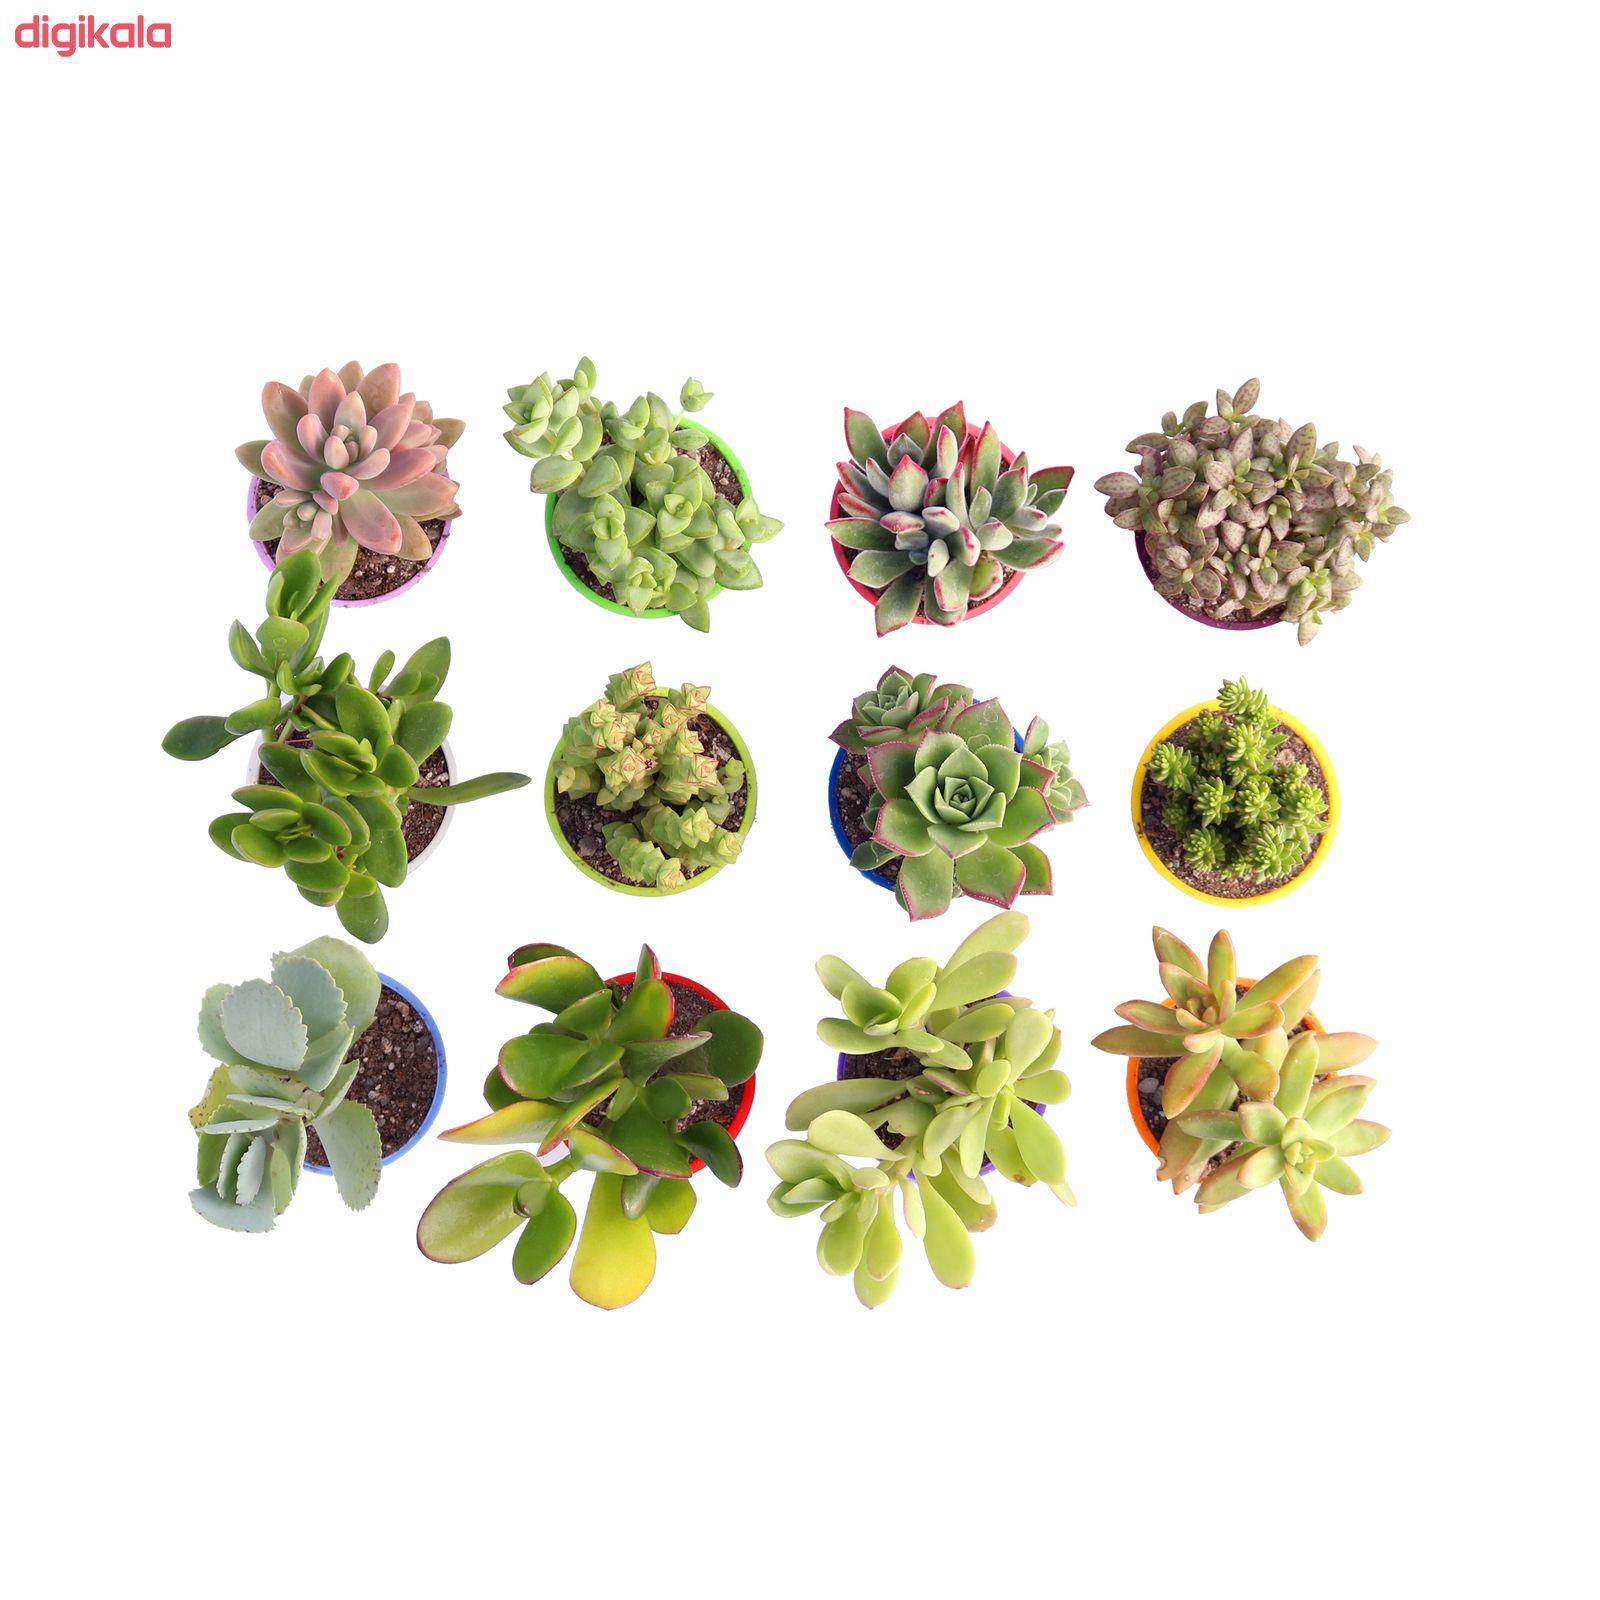 گیاه طبیعی ساکولنت آیدین کاکتوس کد CB-003 بسته 12 عددی main 1 1